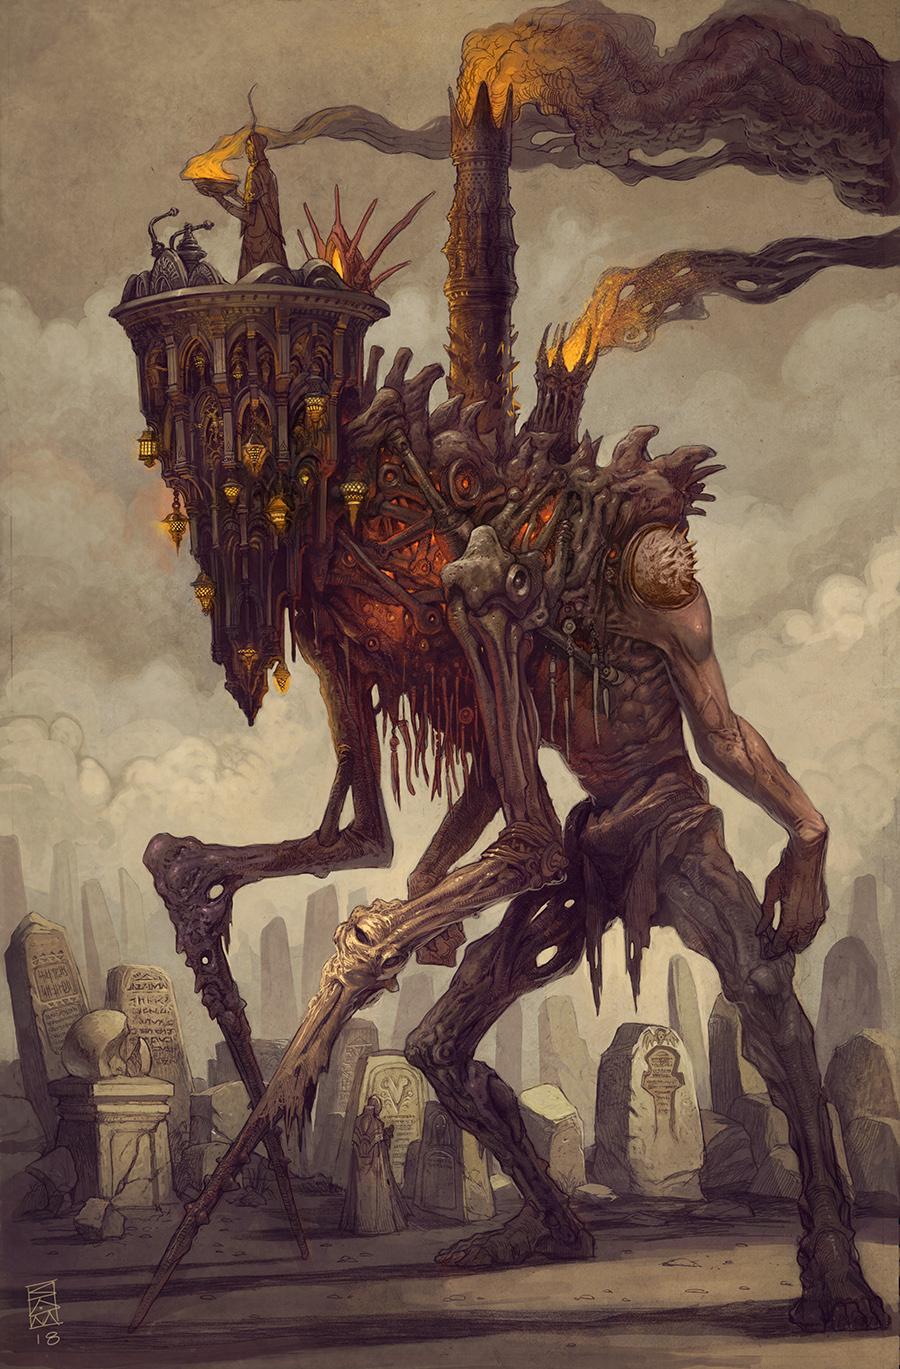 The Grand Bonewalker